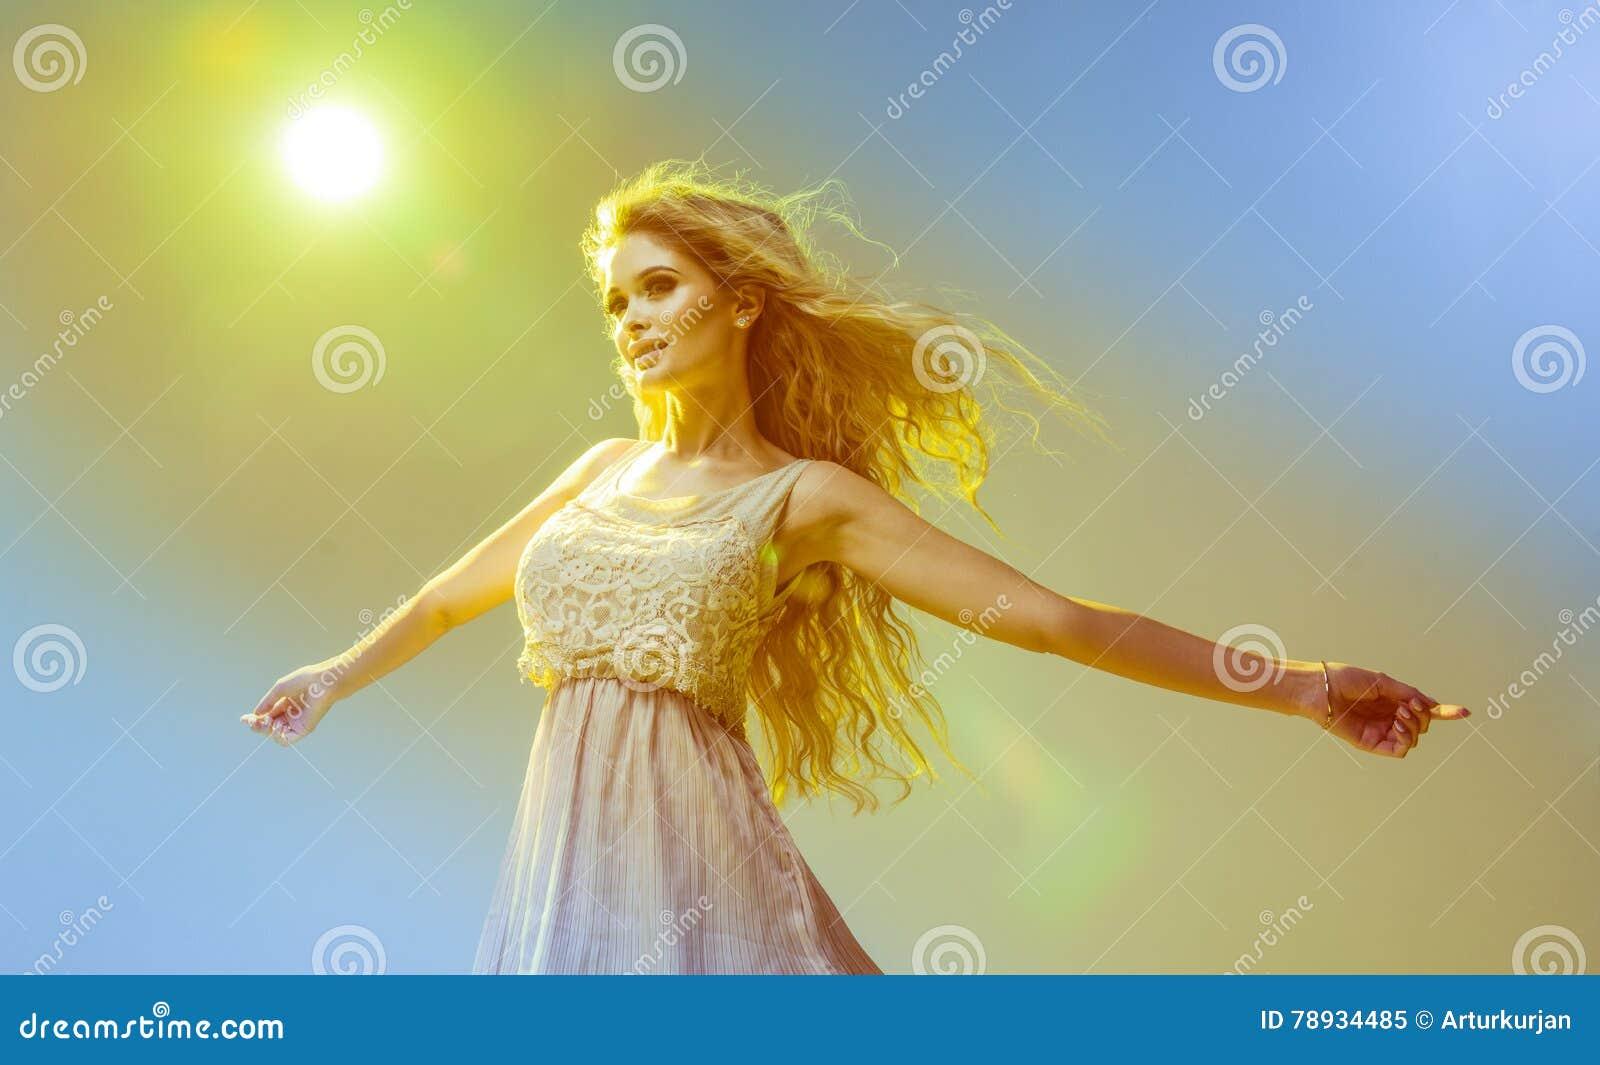 Glamorous Curvy Blonde Woman Stock Image - Image of beautiful ... ac6ae959c3b